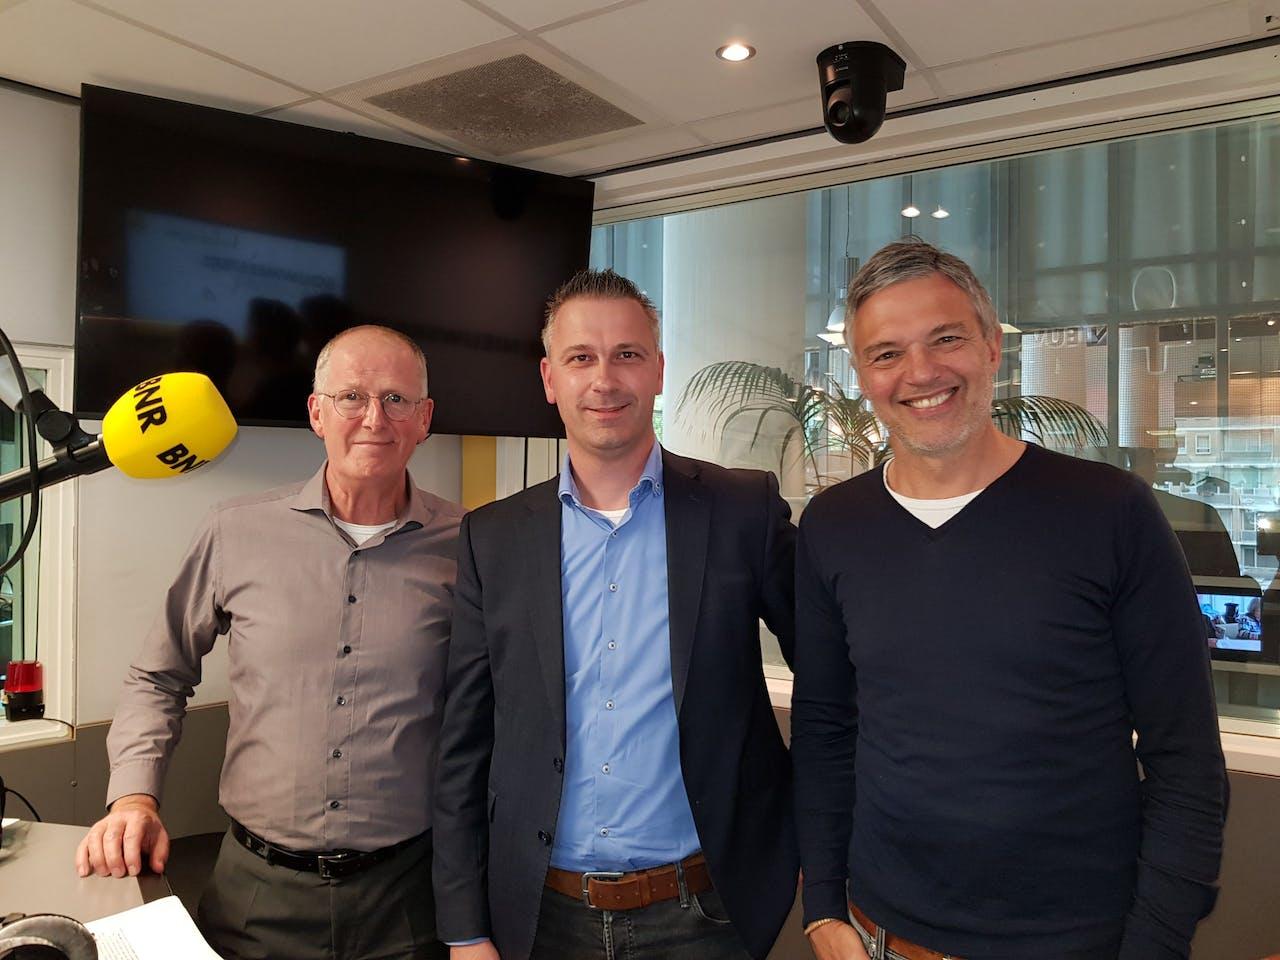 V.l.n.r.: Albert Bergers, Erik Colijn en Paul Laseur.